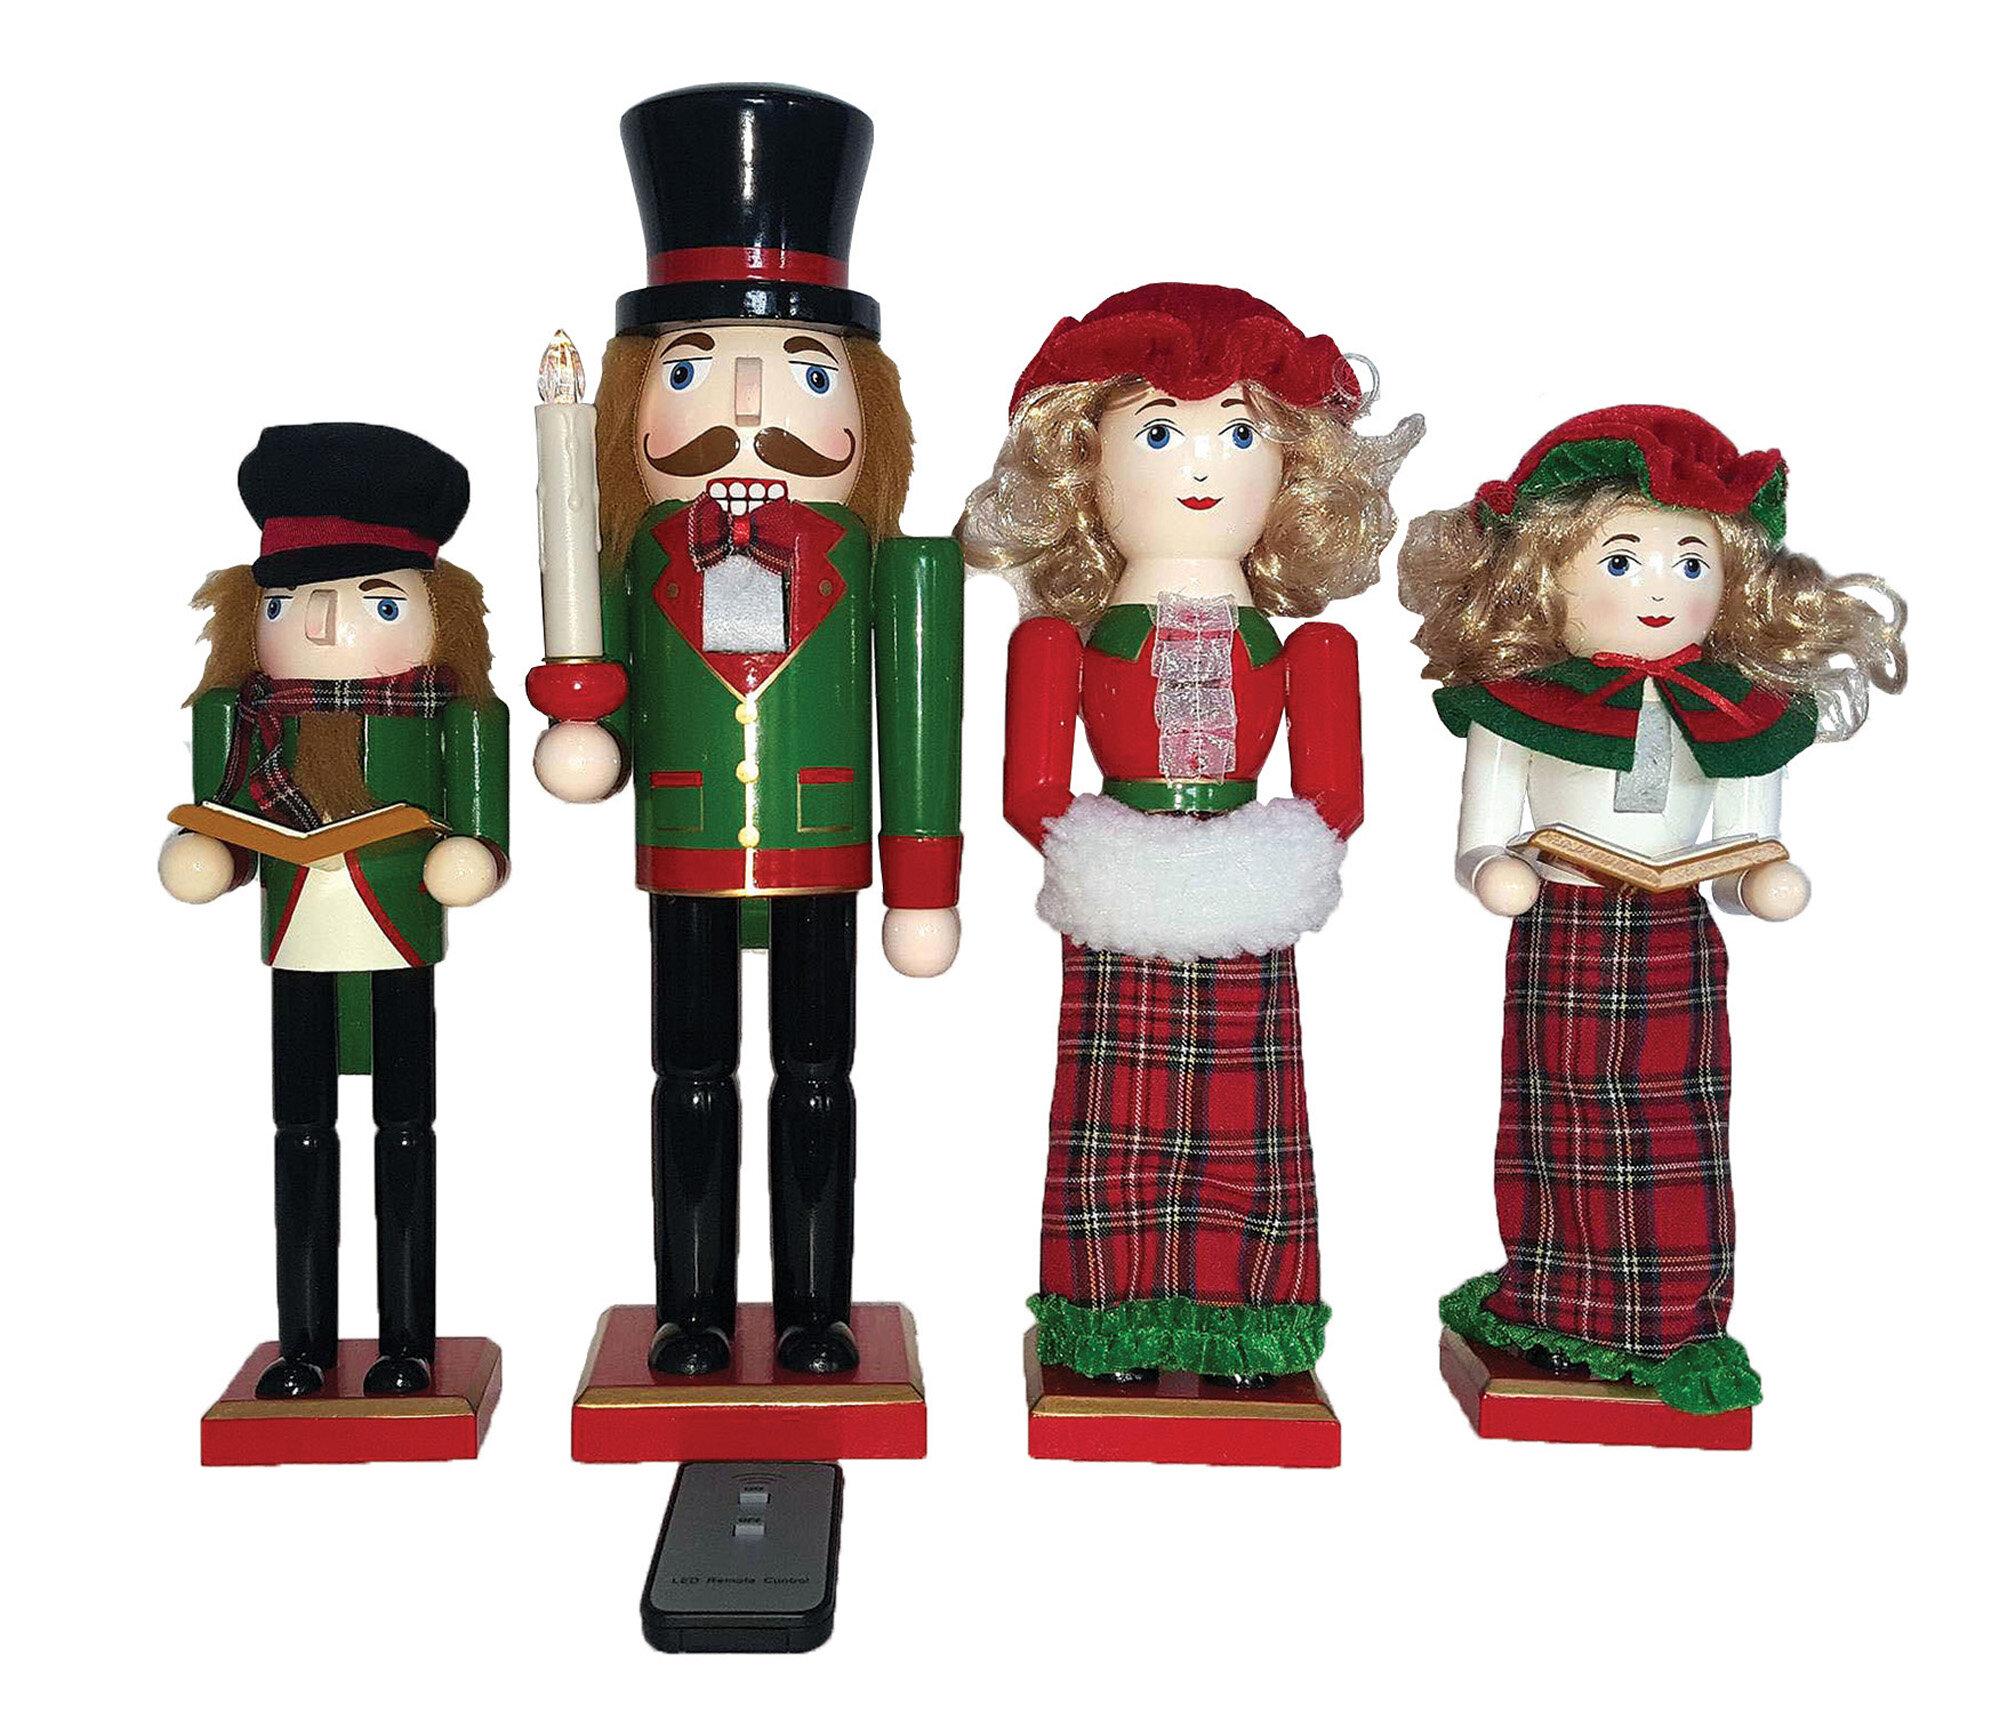 The Holiday Aisle 4 Piece LED Dickens Caroler Nutcracker Set